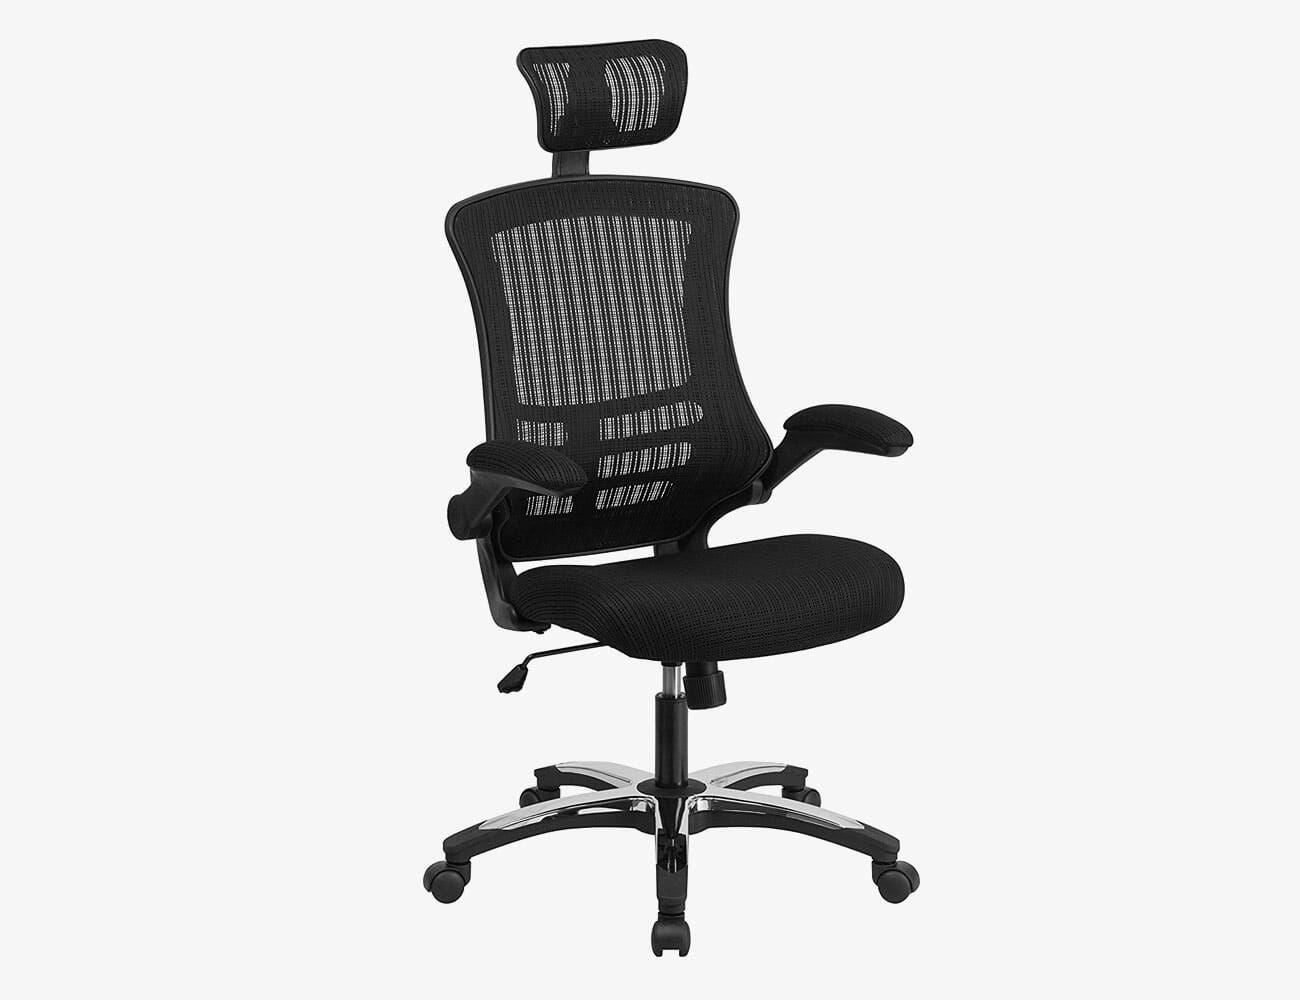 Fabulous The 14 Best Office Chairs Of 2019 Gear Patrol Machost Co Dining Chair Design Ideas Machostcouk